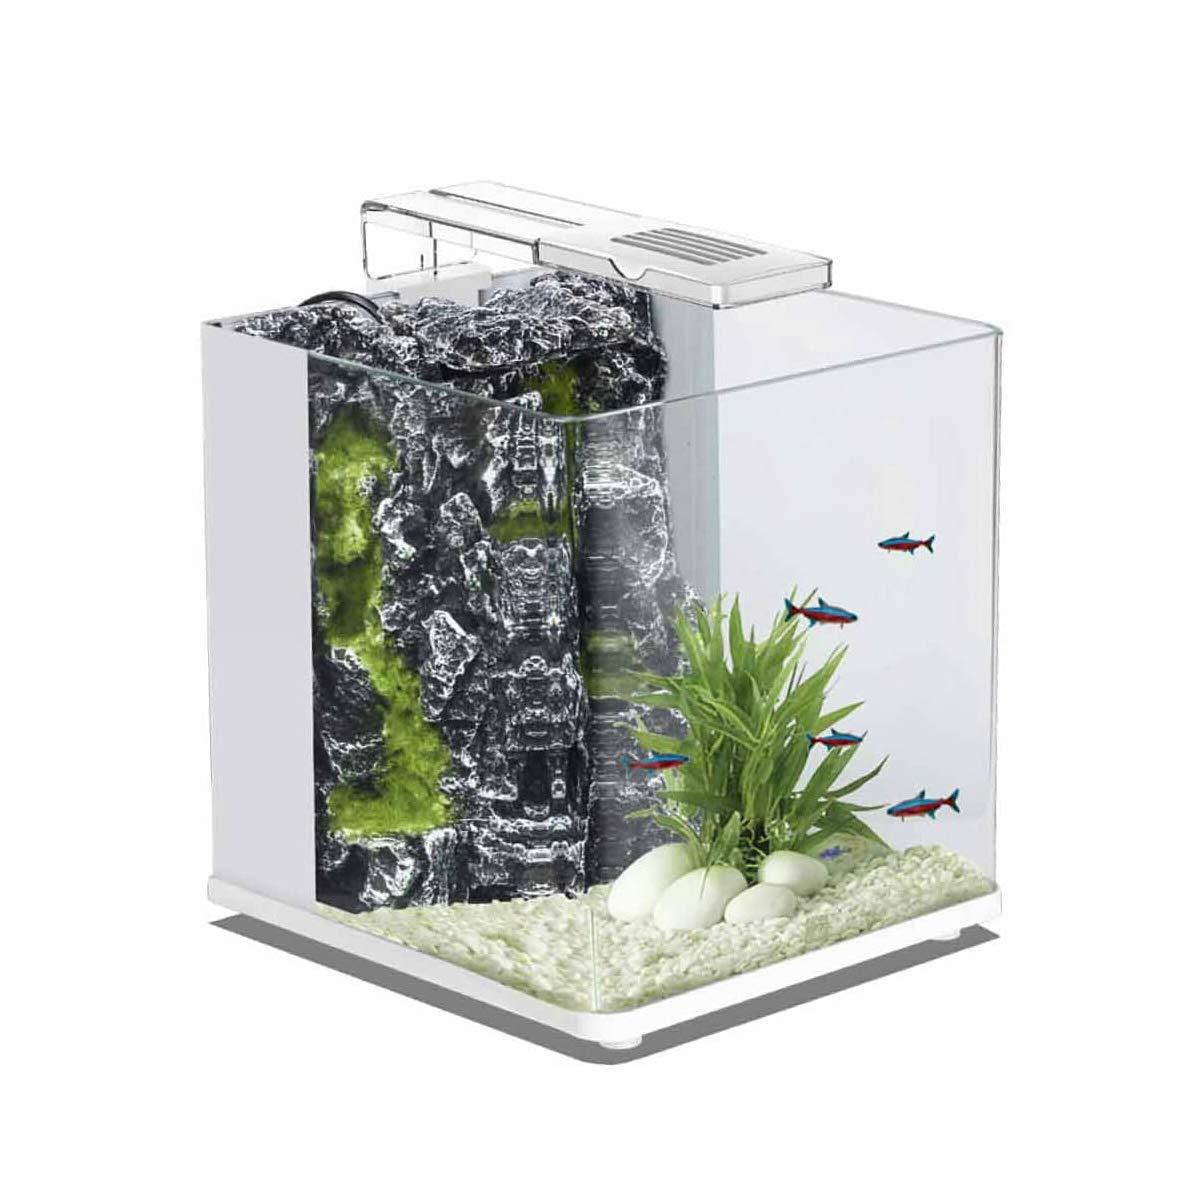 blueBios Nanux Rock Glass Aquarium 18 Litres White